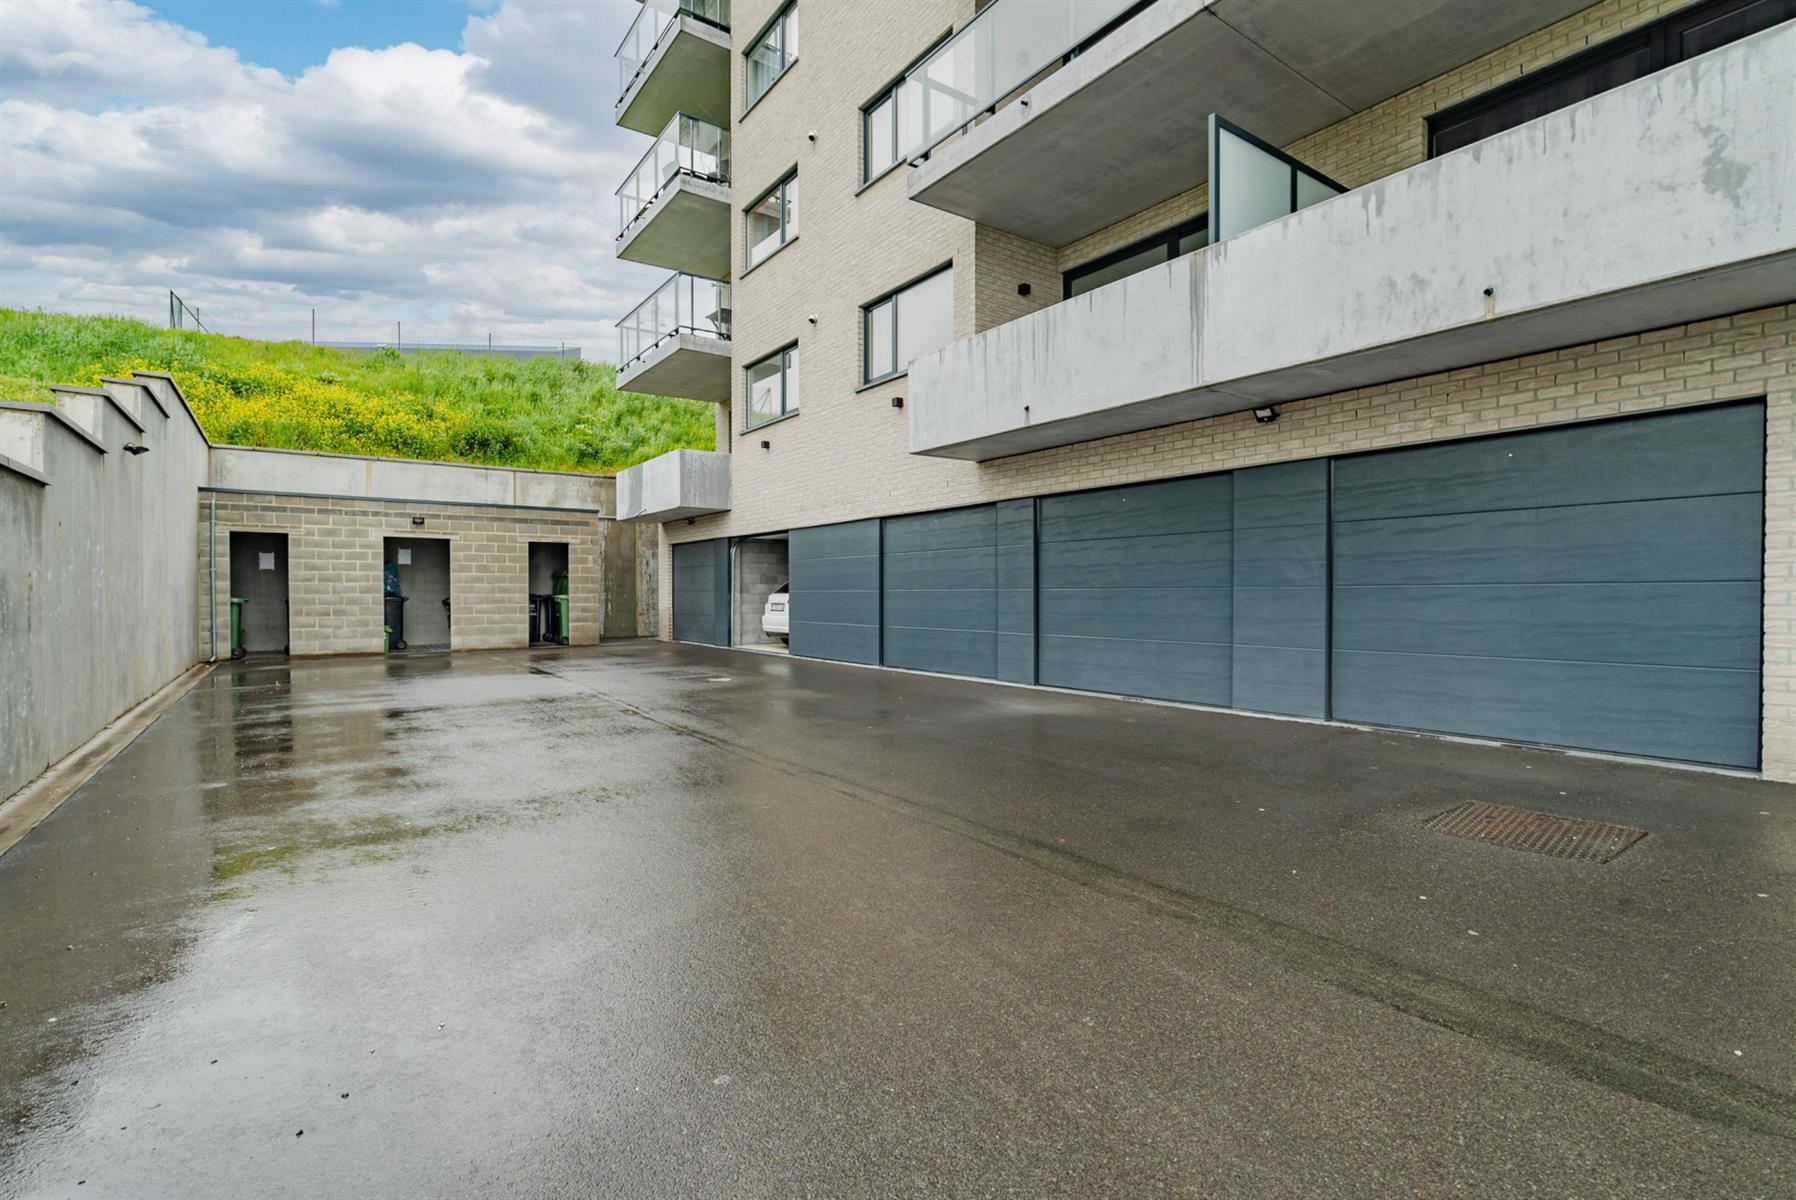 Appartement - Grâce-hollogne - #4364483-24